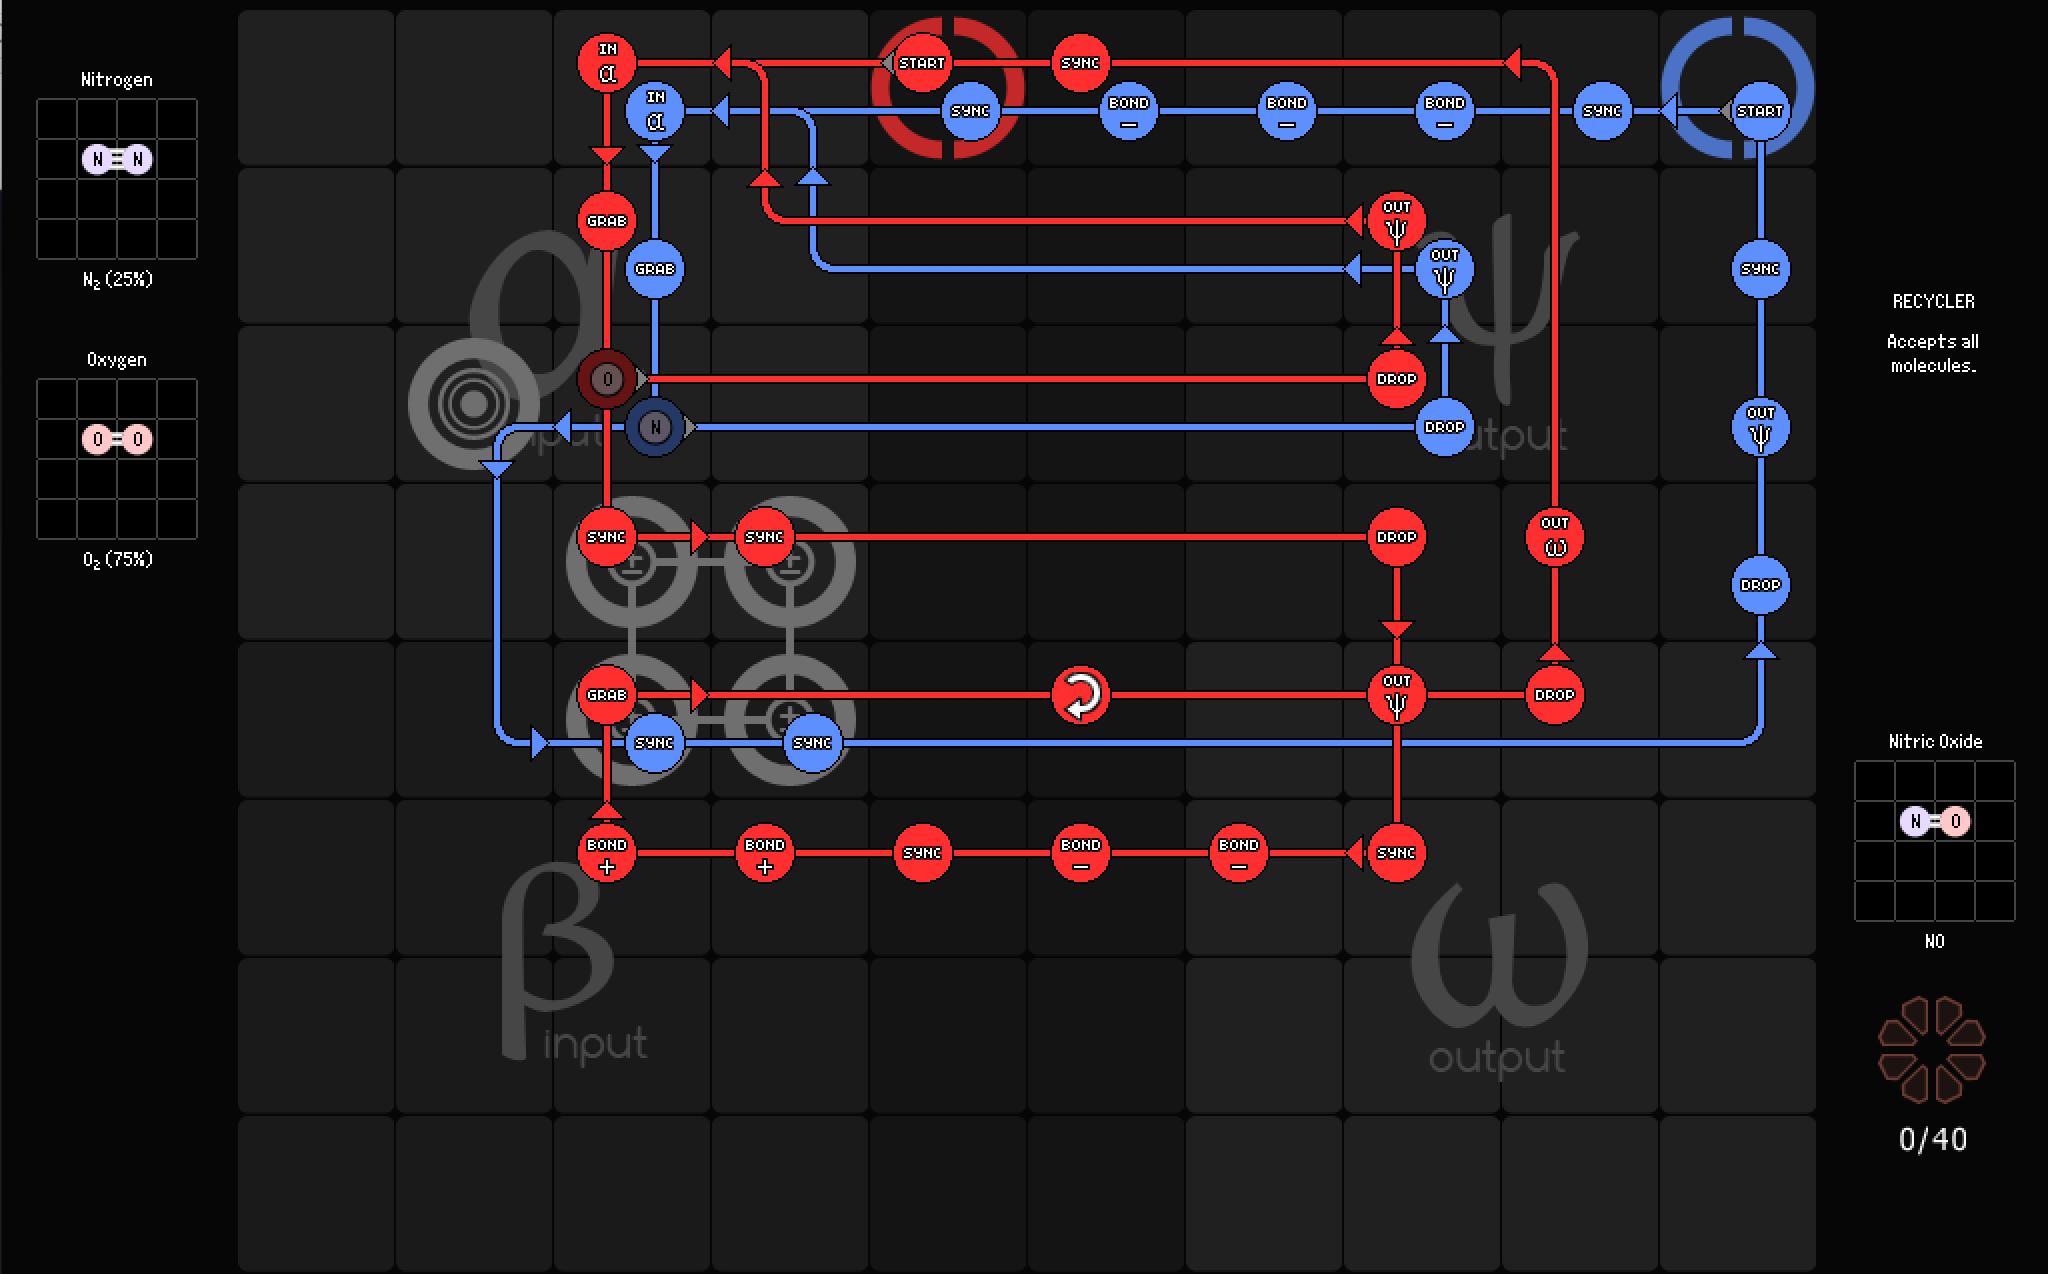 1_Story_Mode/4_Alkonost/SpaceChem-4.4.b/Reactor.png